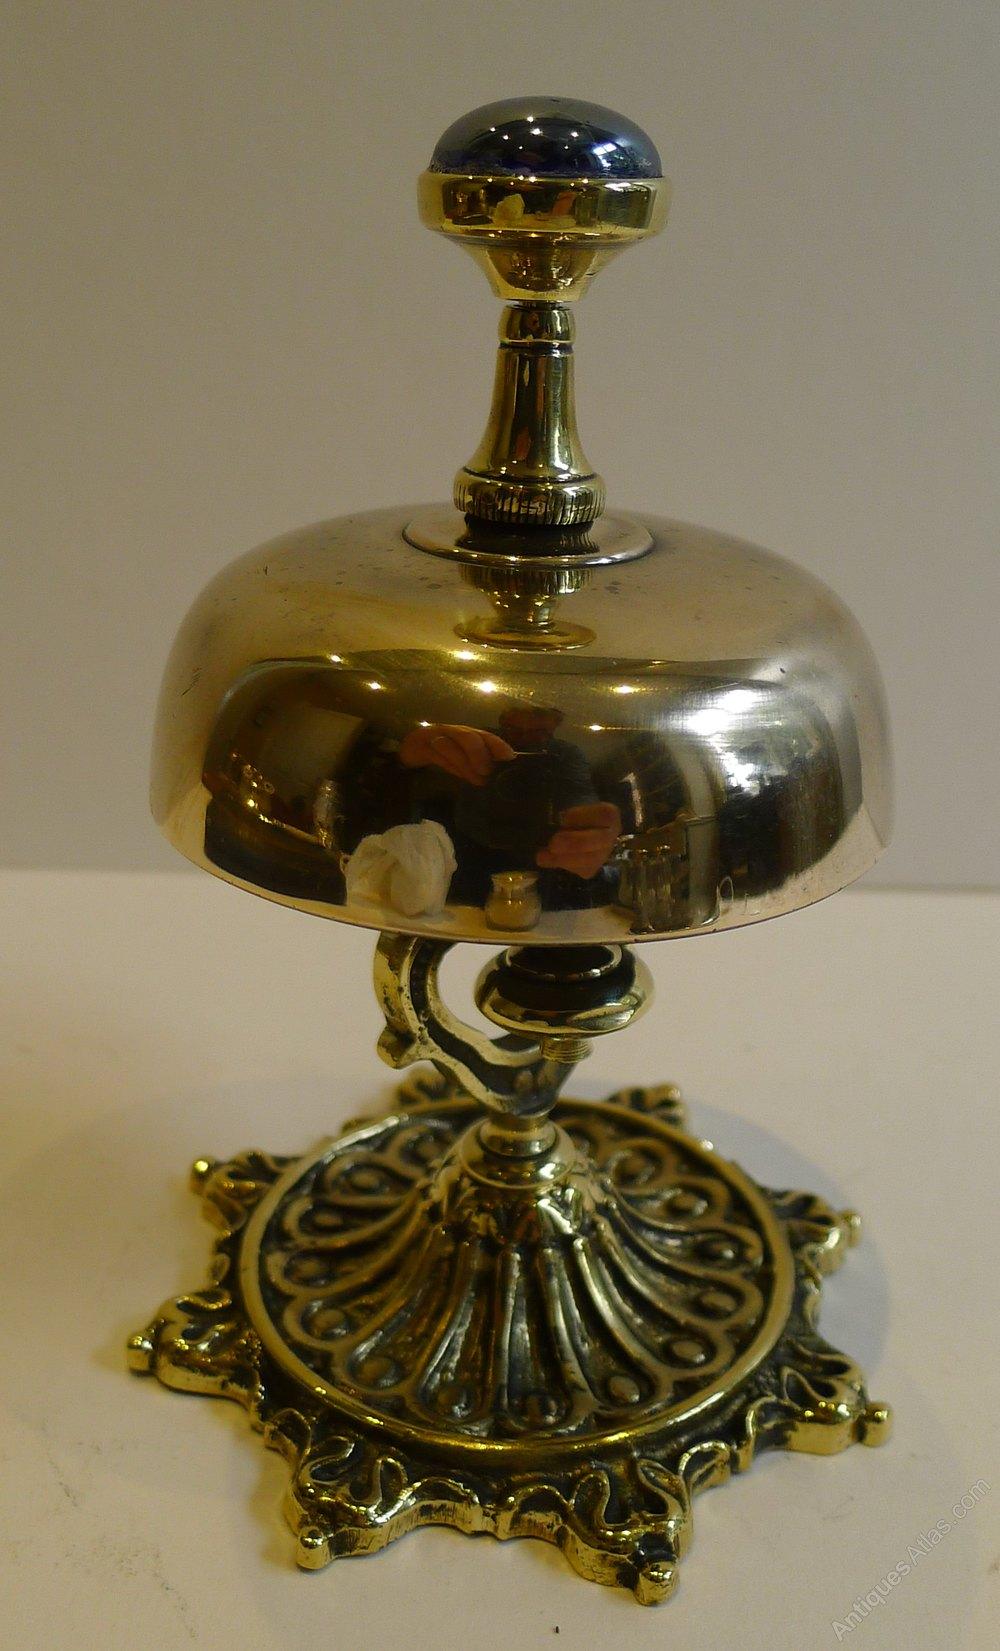 Antique English Brass Desk Bell C 1880